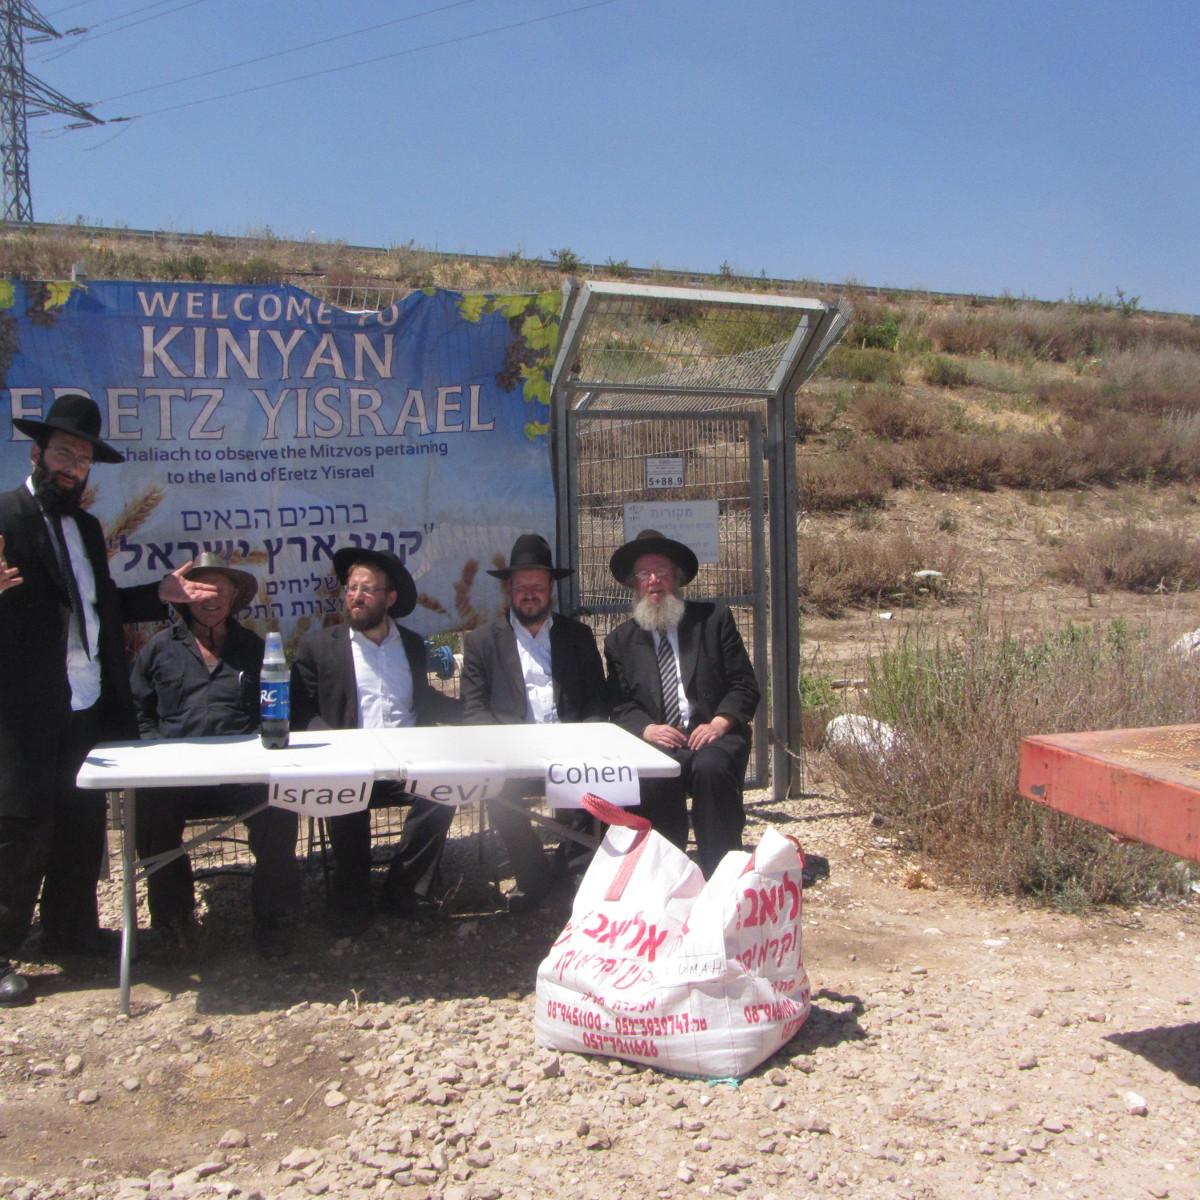 Tromut&Maasrot: Cohen, Levi, Israel